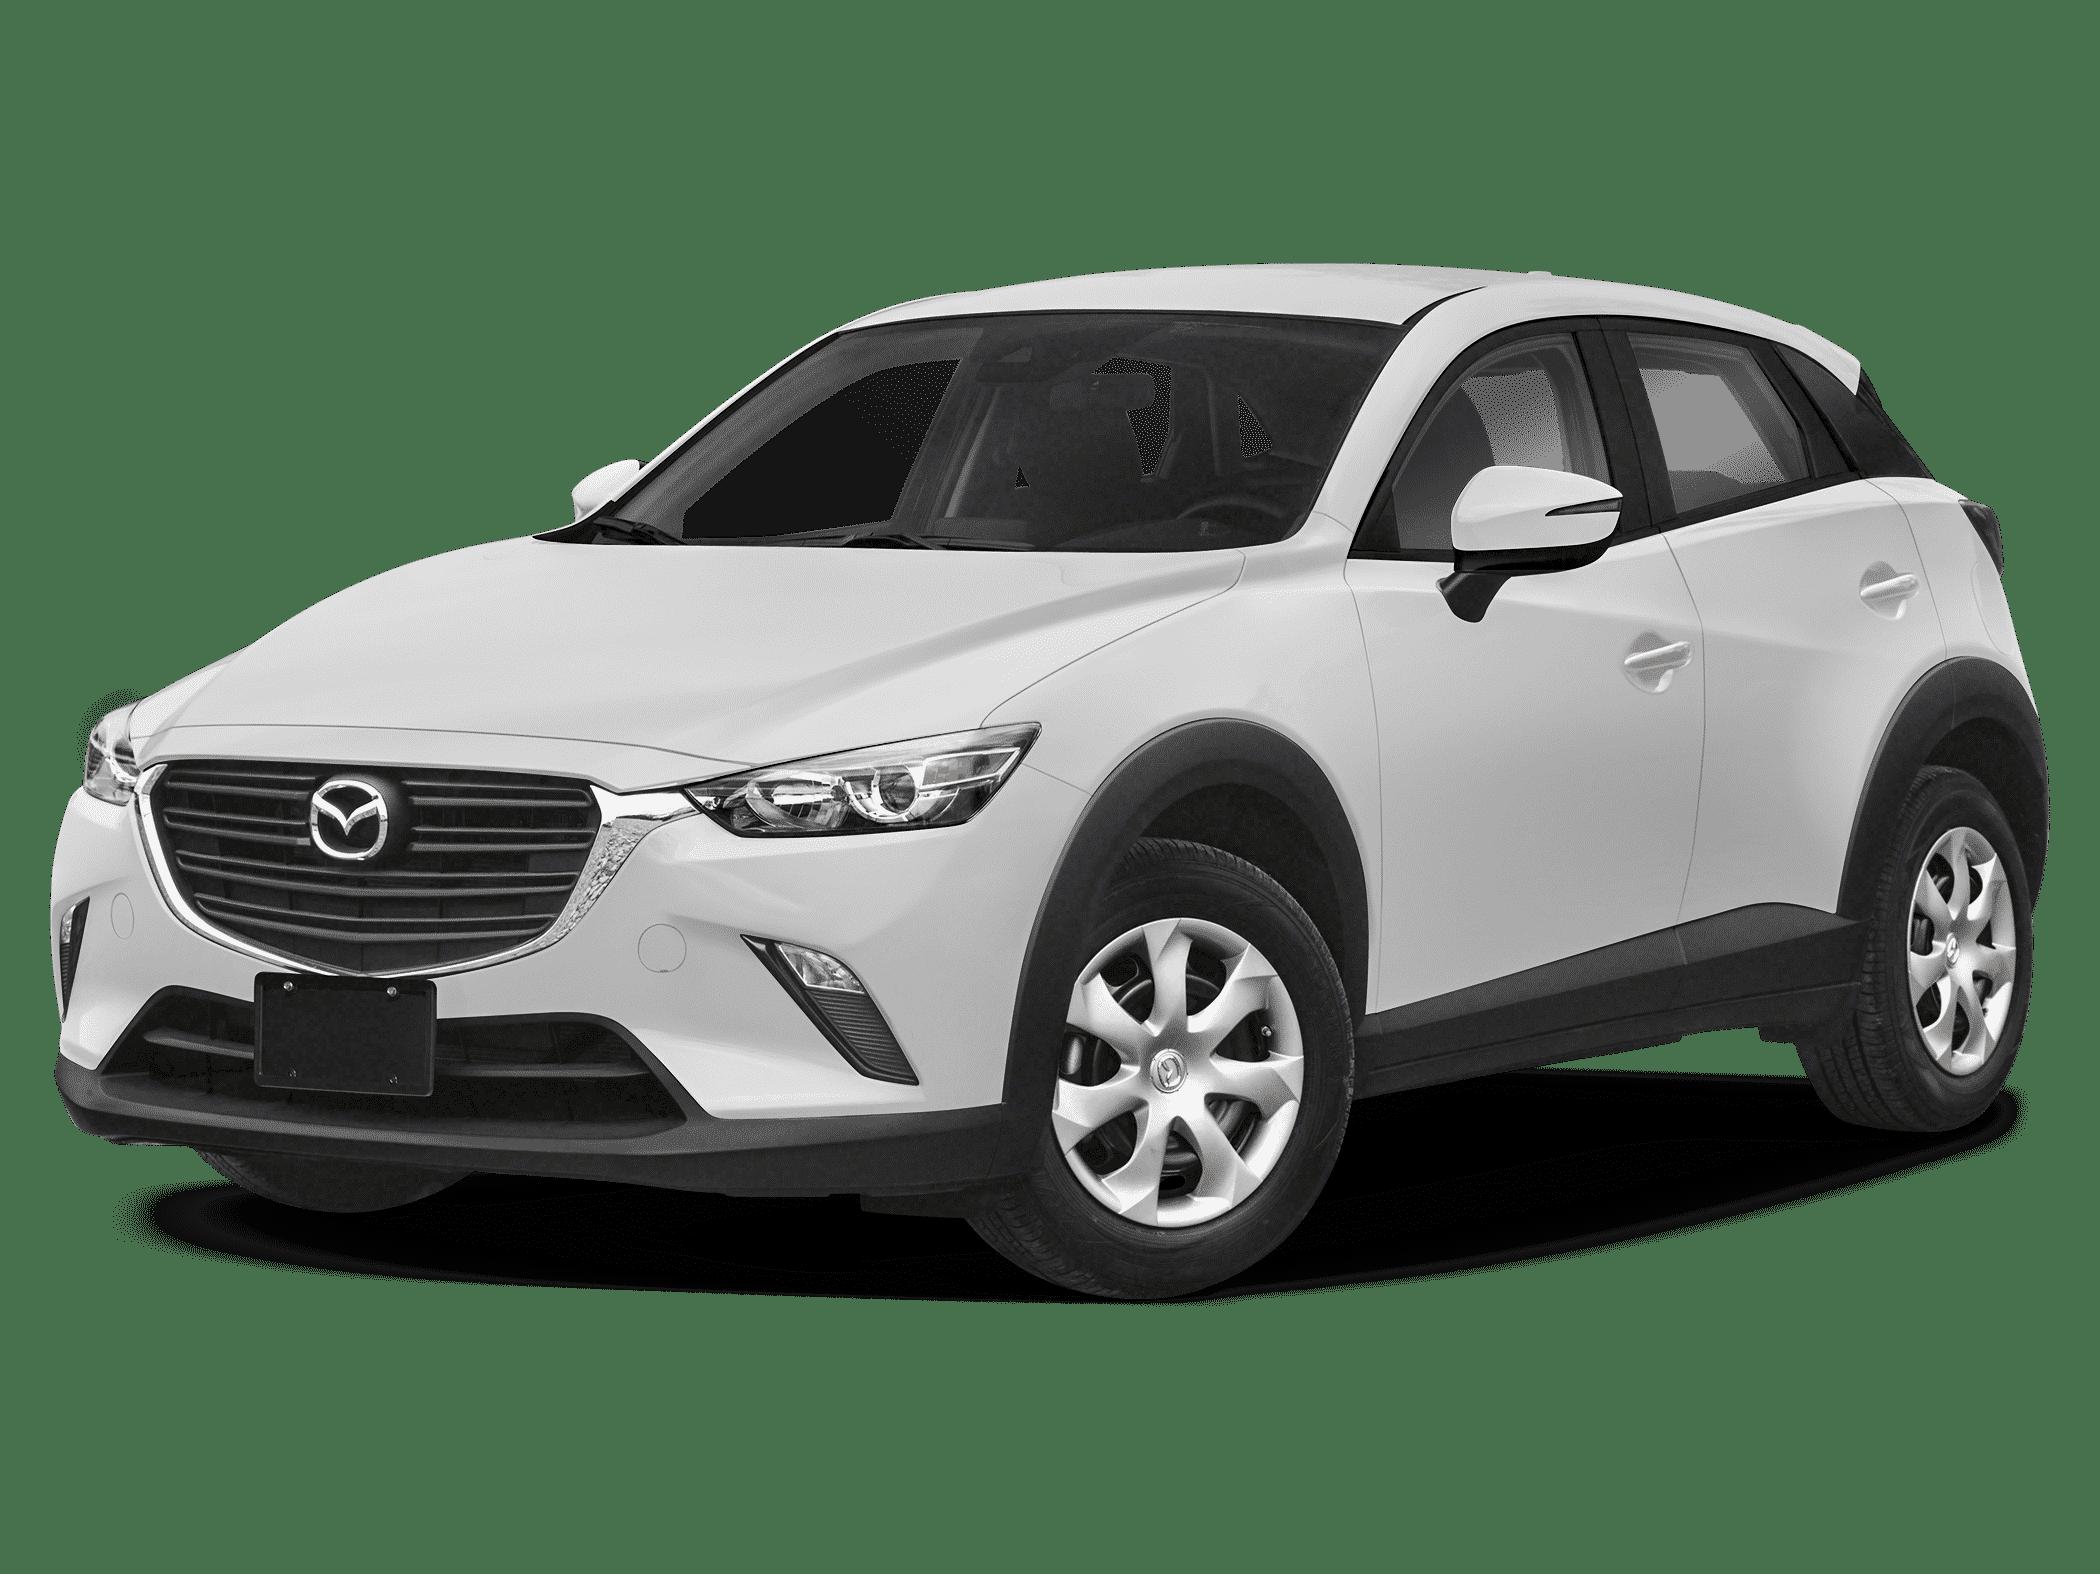 2020 Mazda CX 3 Dealer Pricing Report